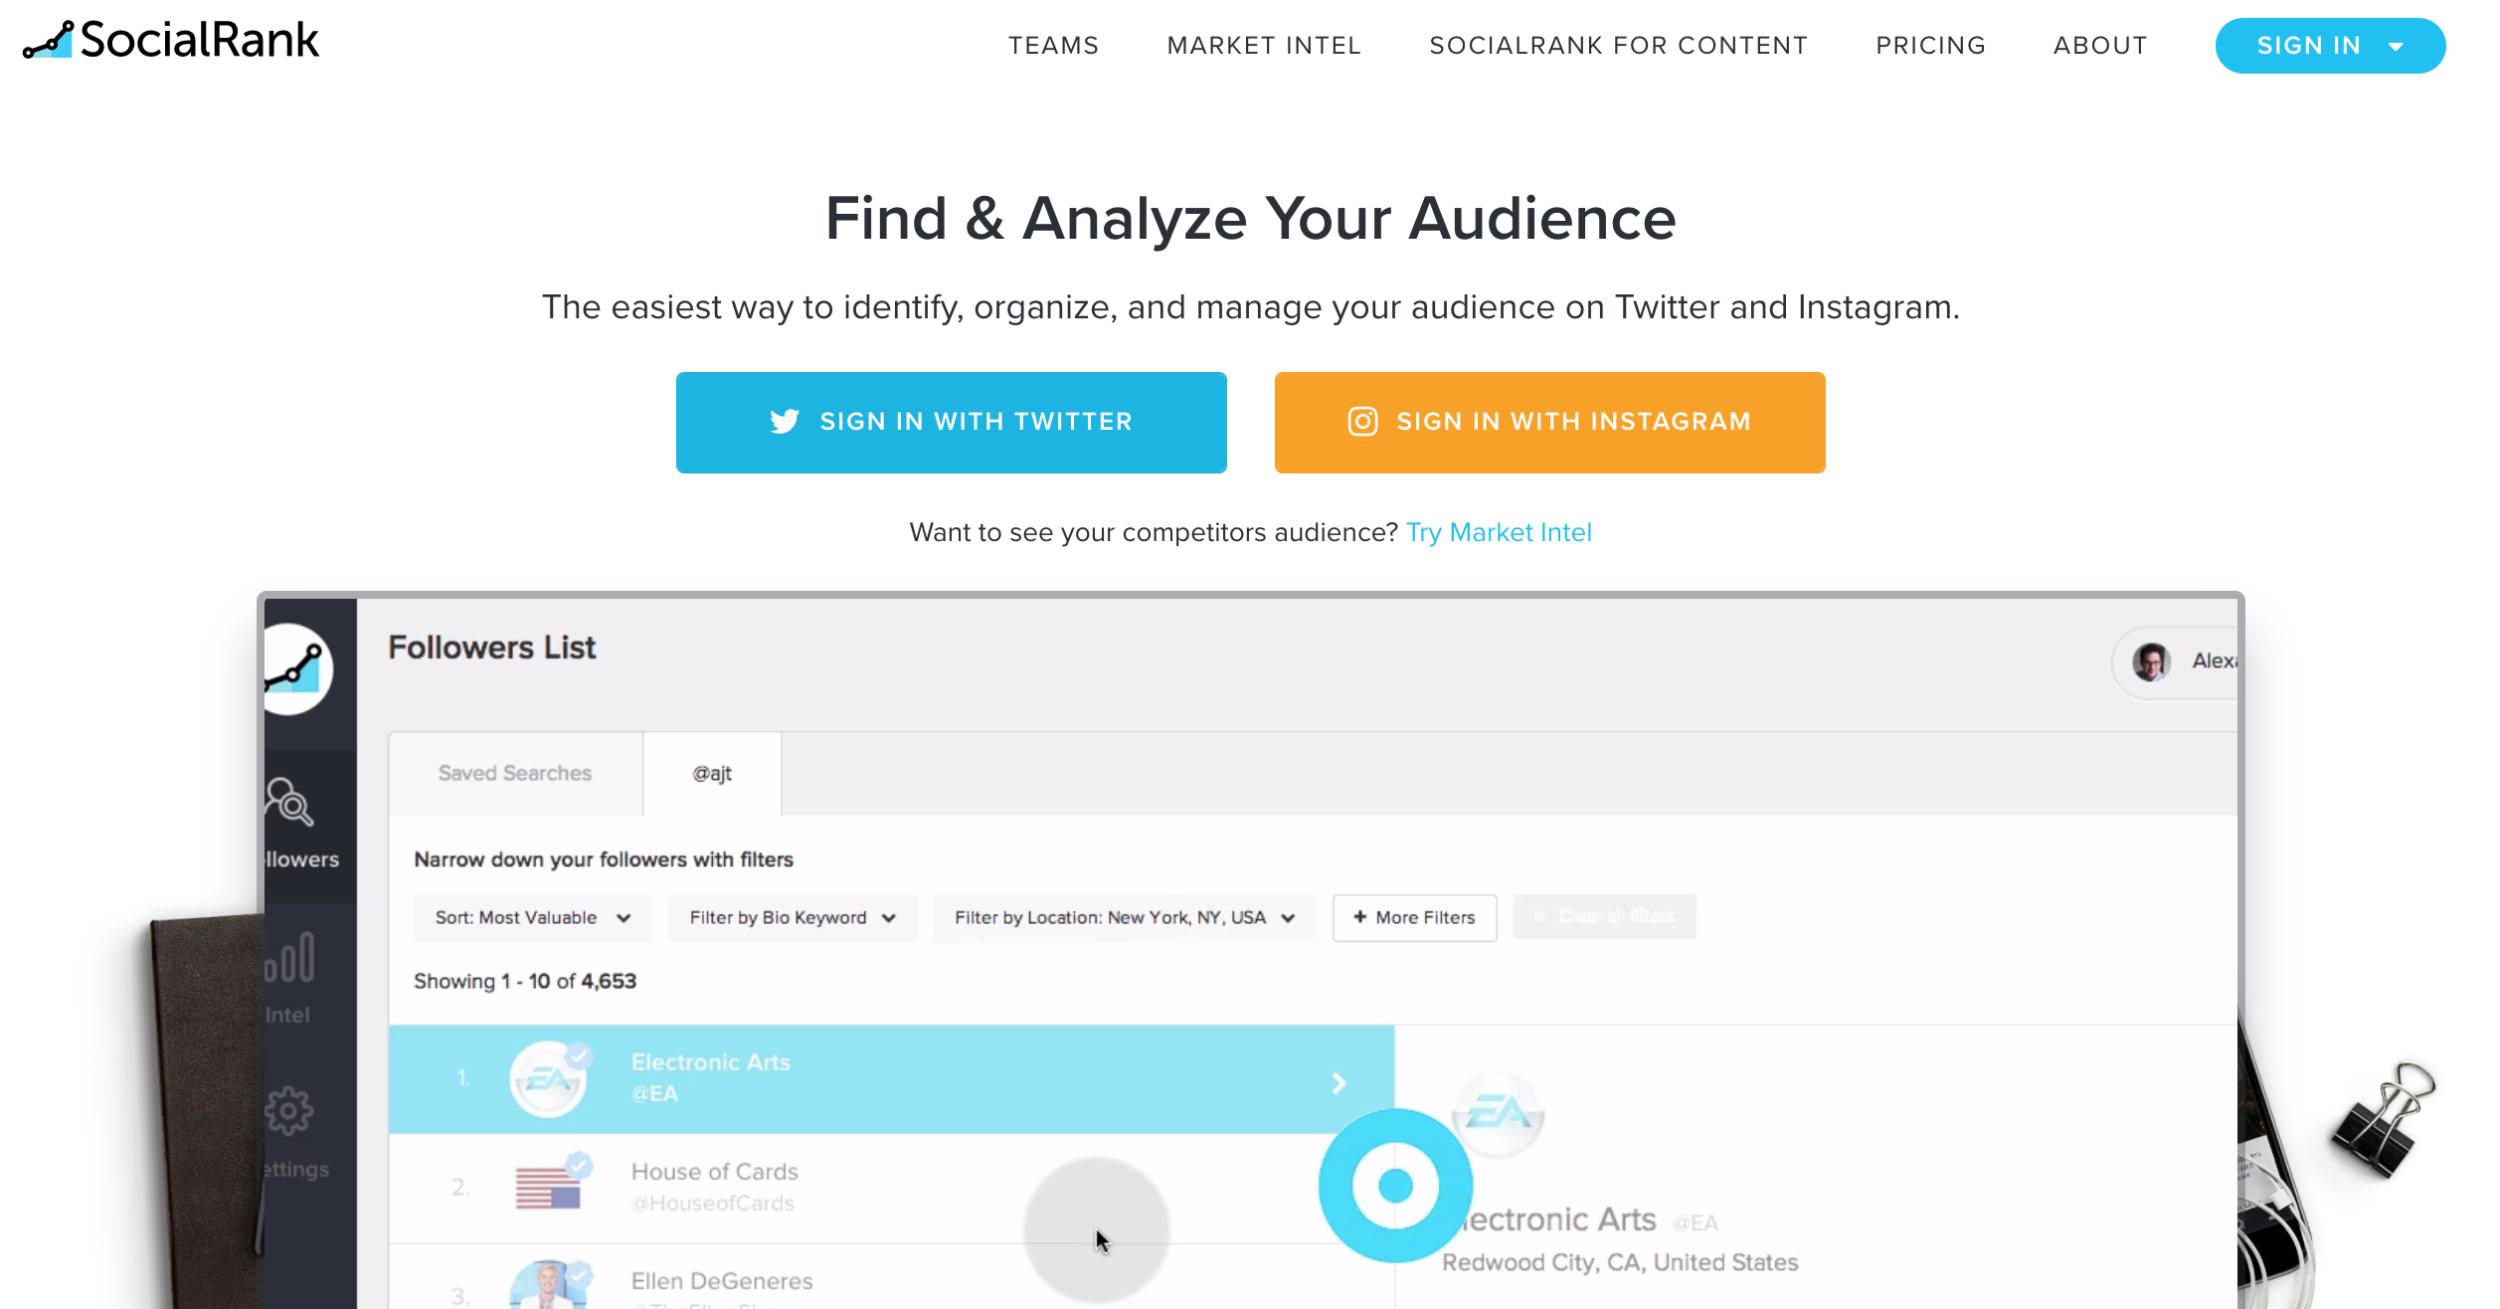 socialrank - instagram analytics tools